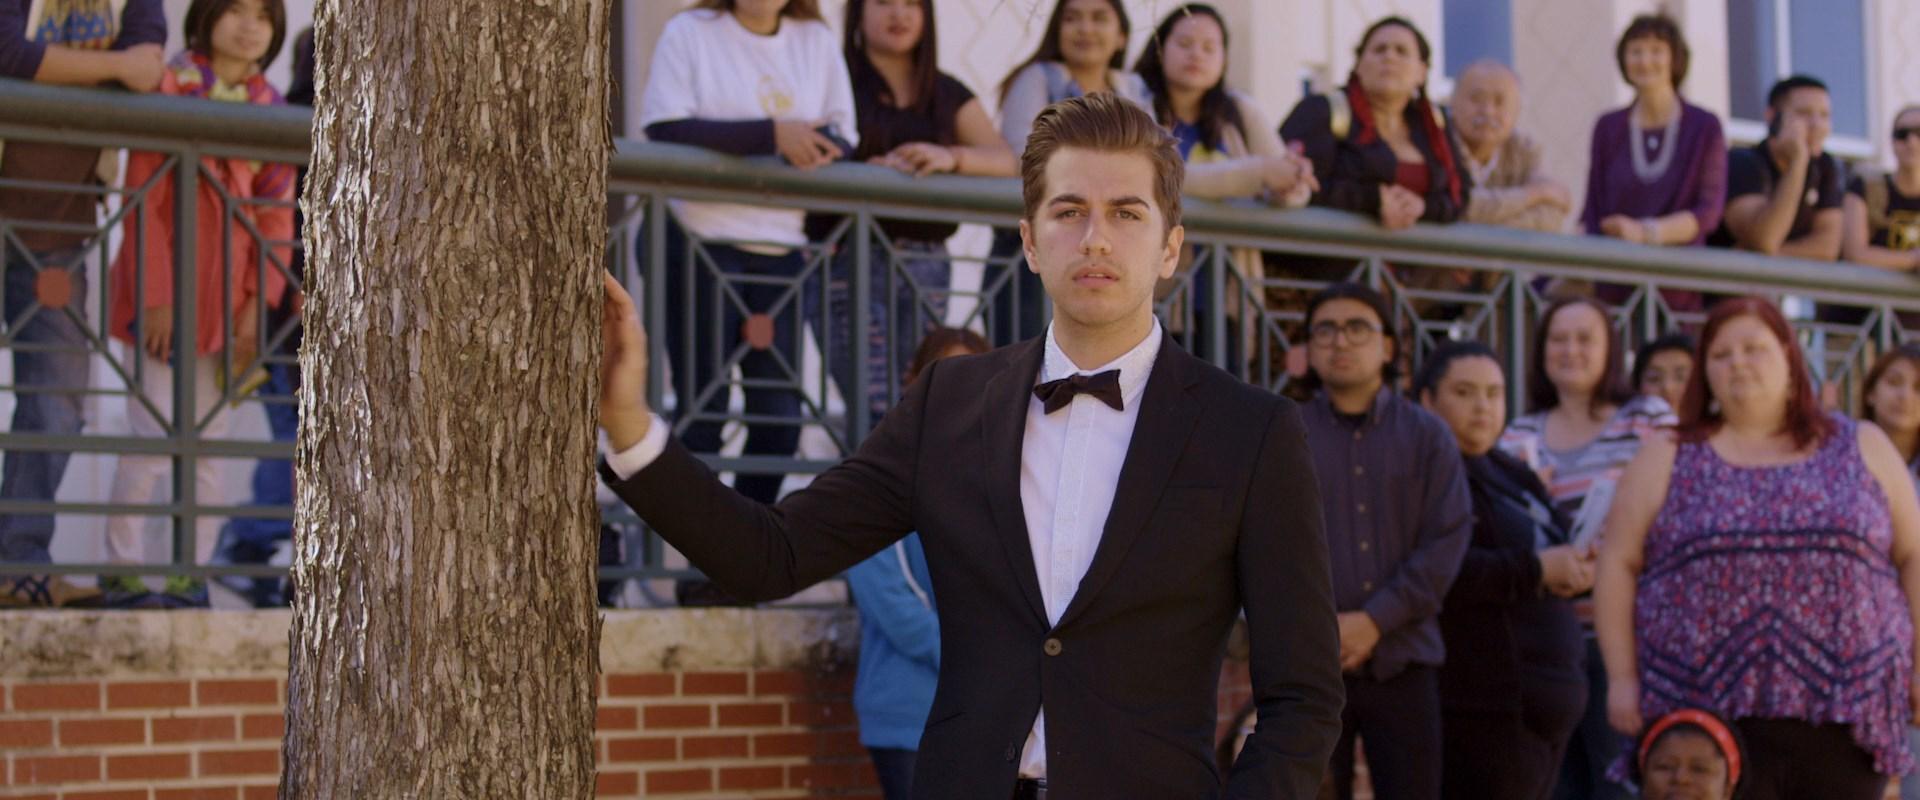 The Margarita Man (2019) 1080p WEB-DL Latino